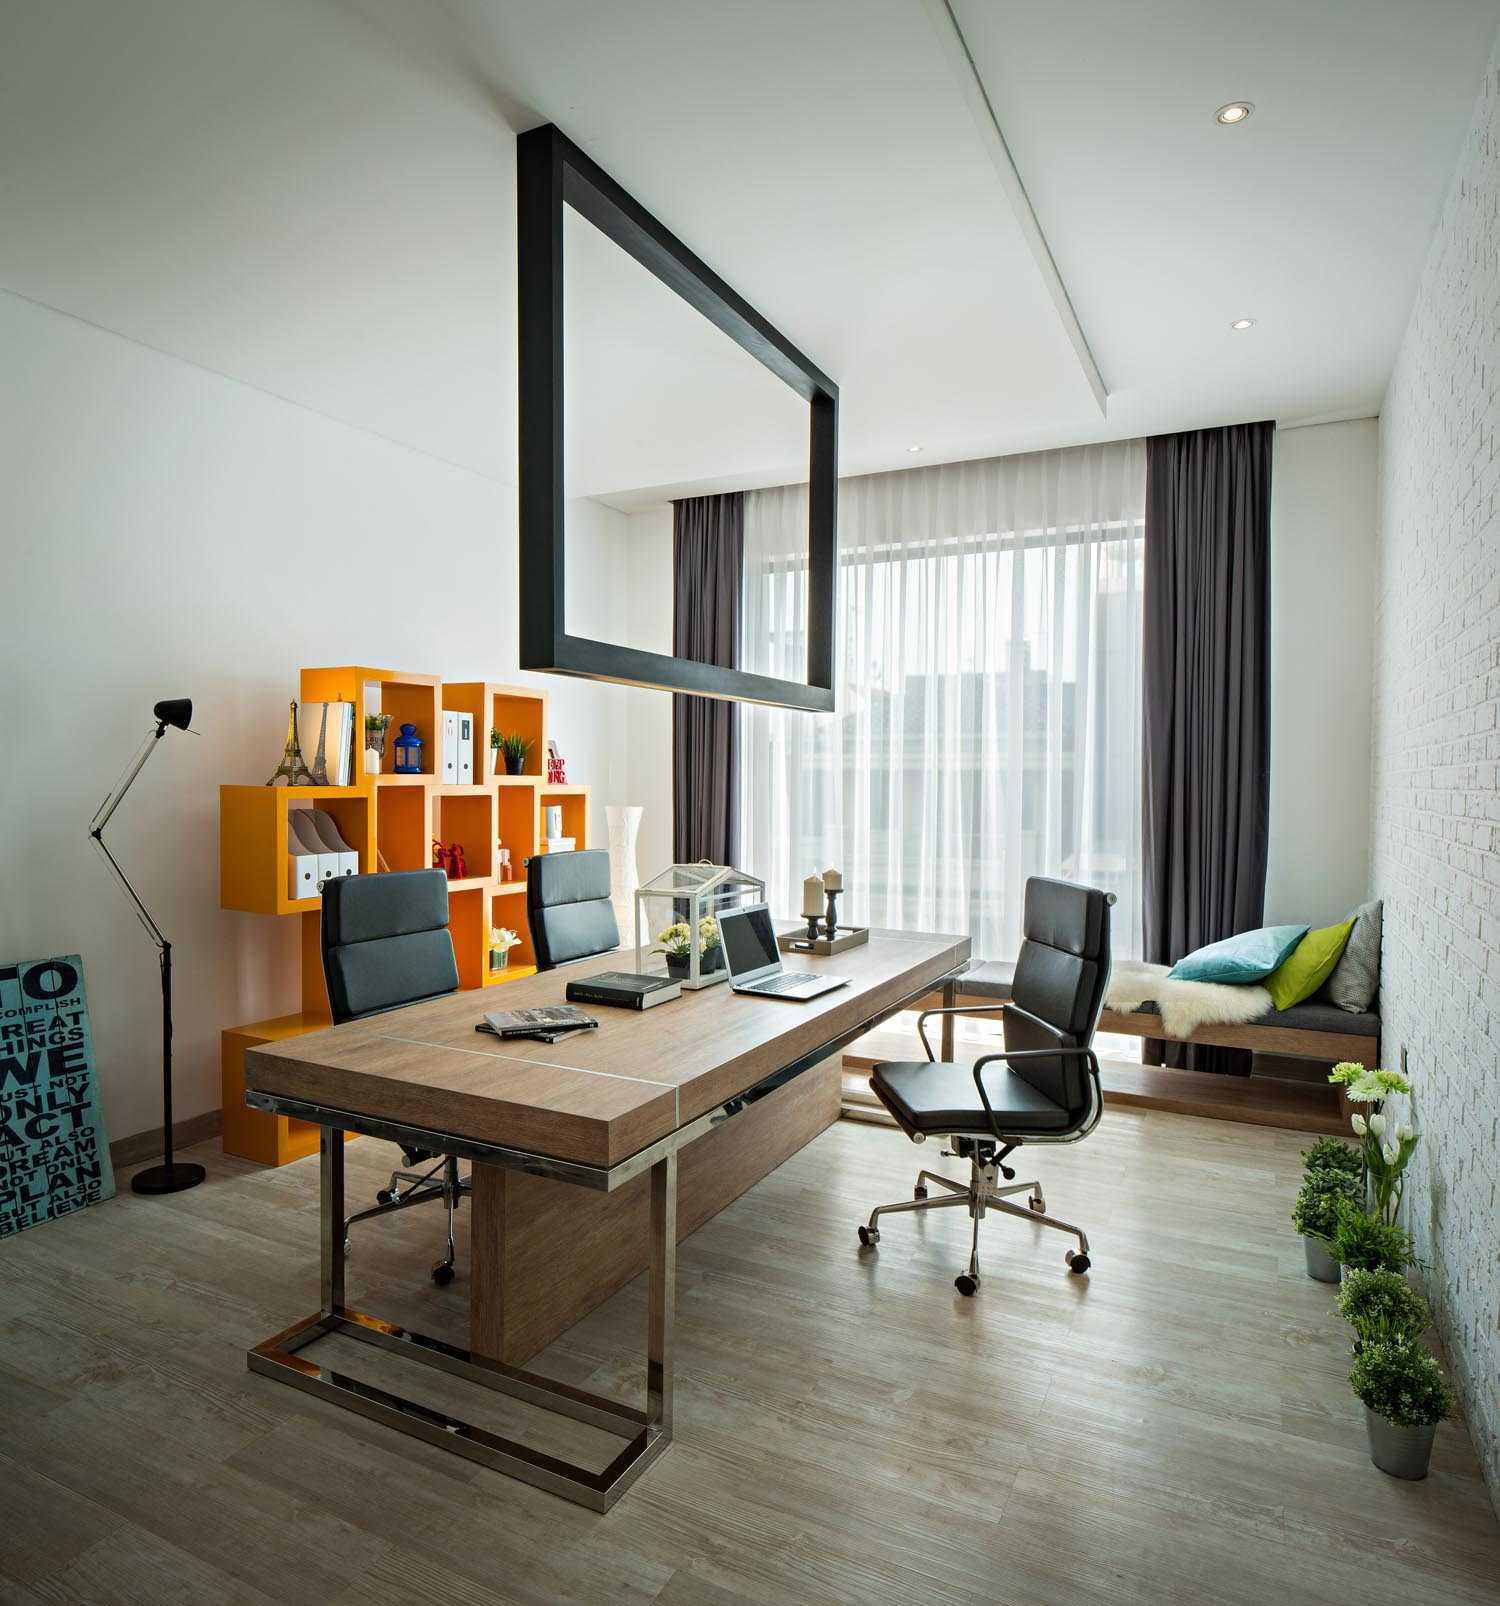 Dp+Hs Architects S+I House Jakarta, Indonesia Jakarta, Indonesia Working Area Kontemporer,industrial,modern  12035